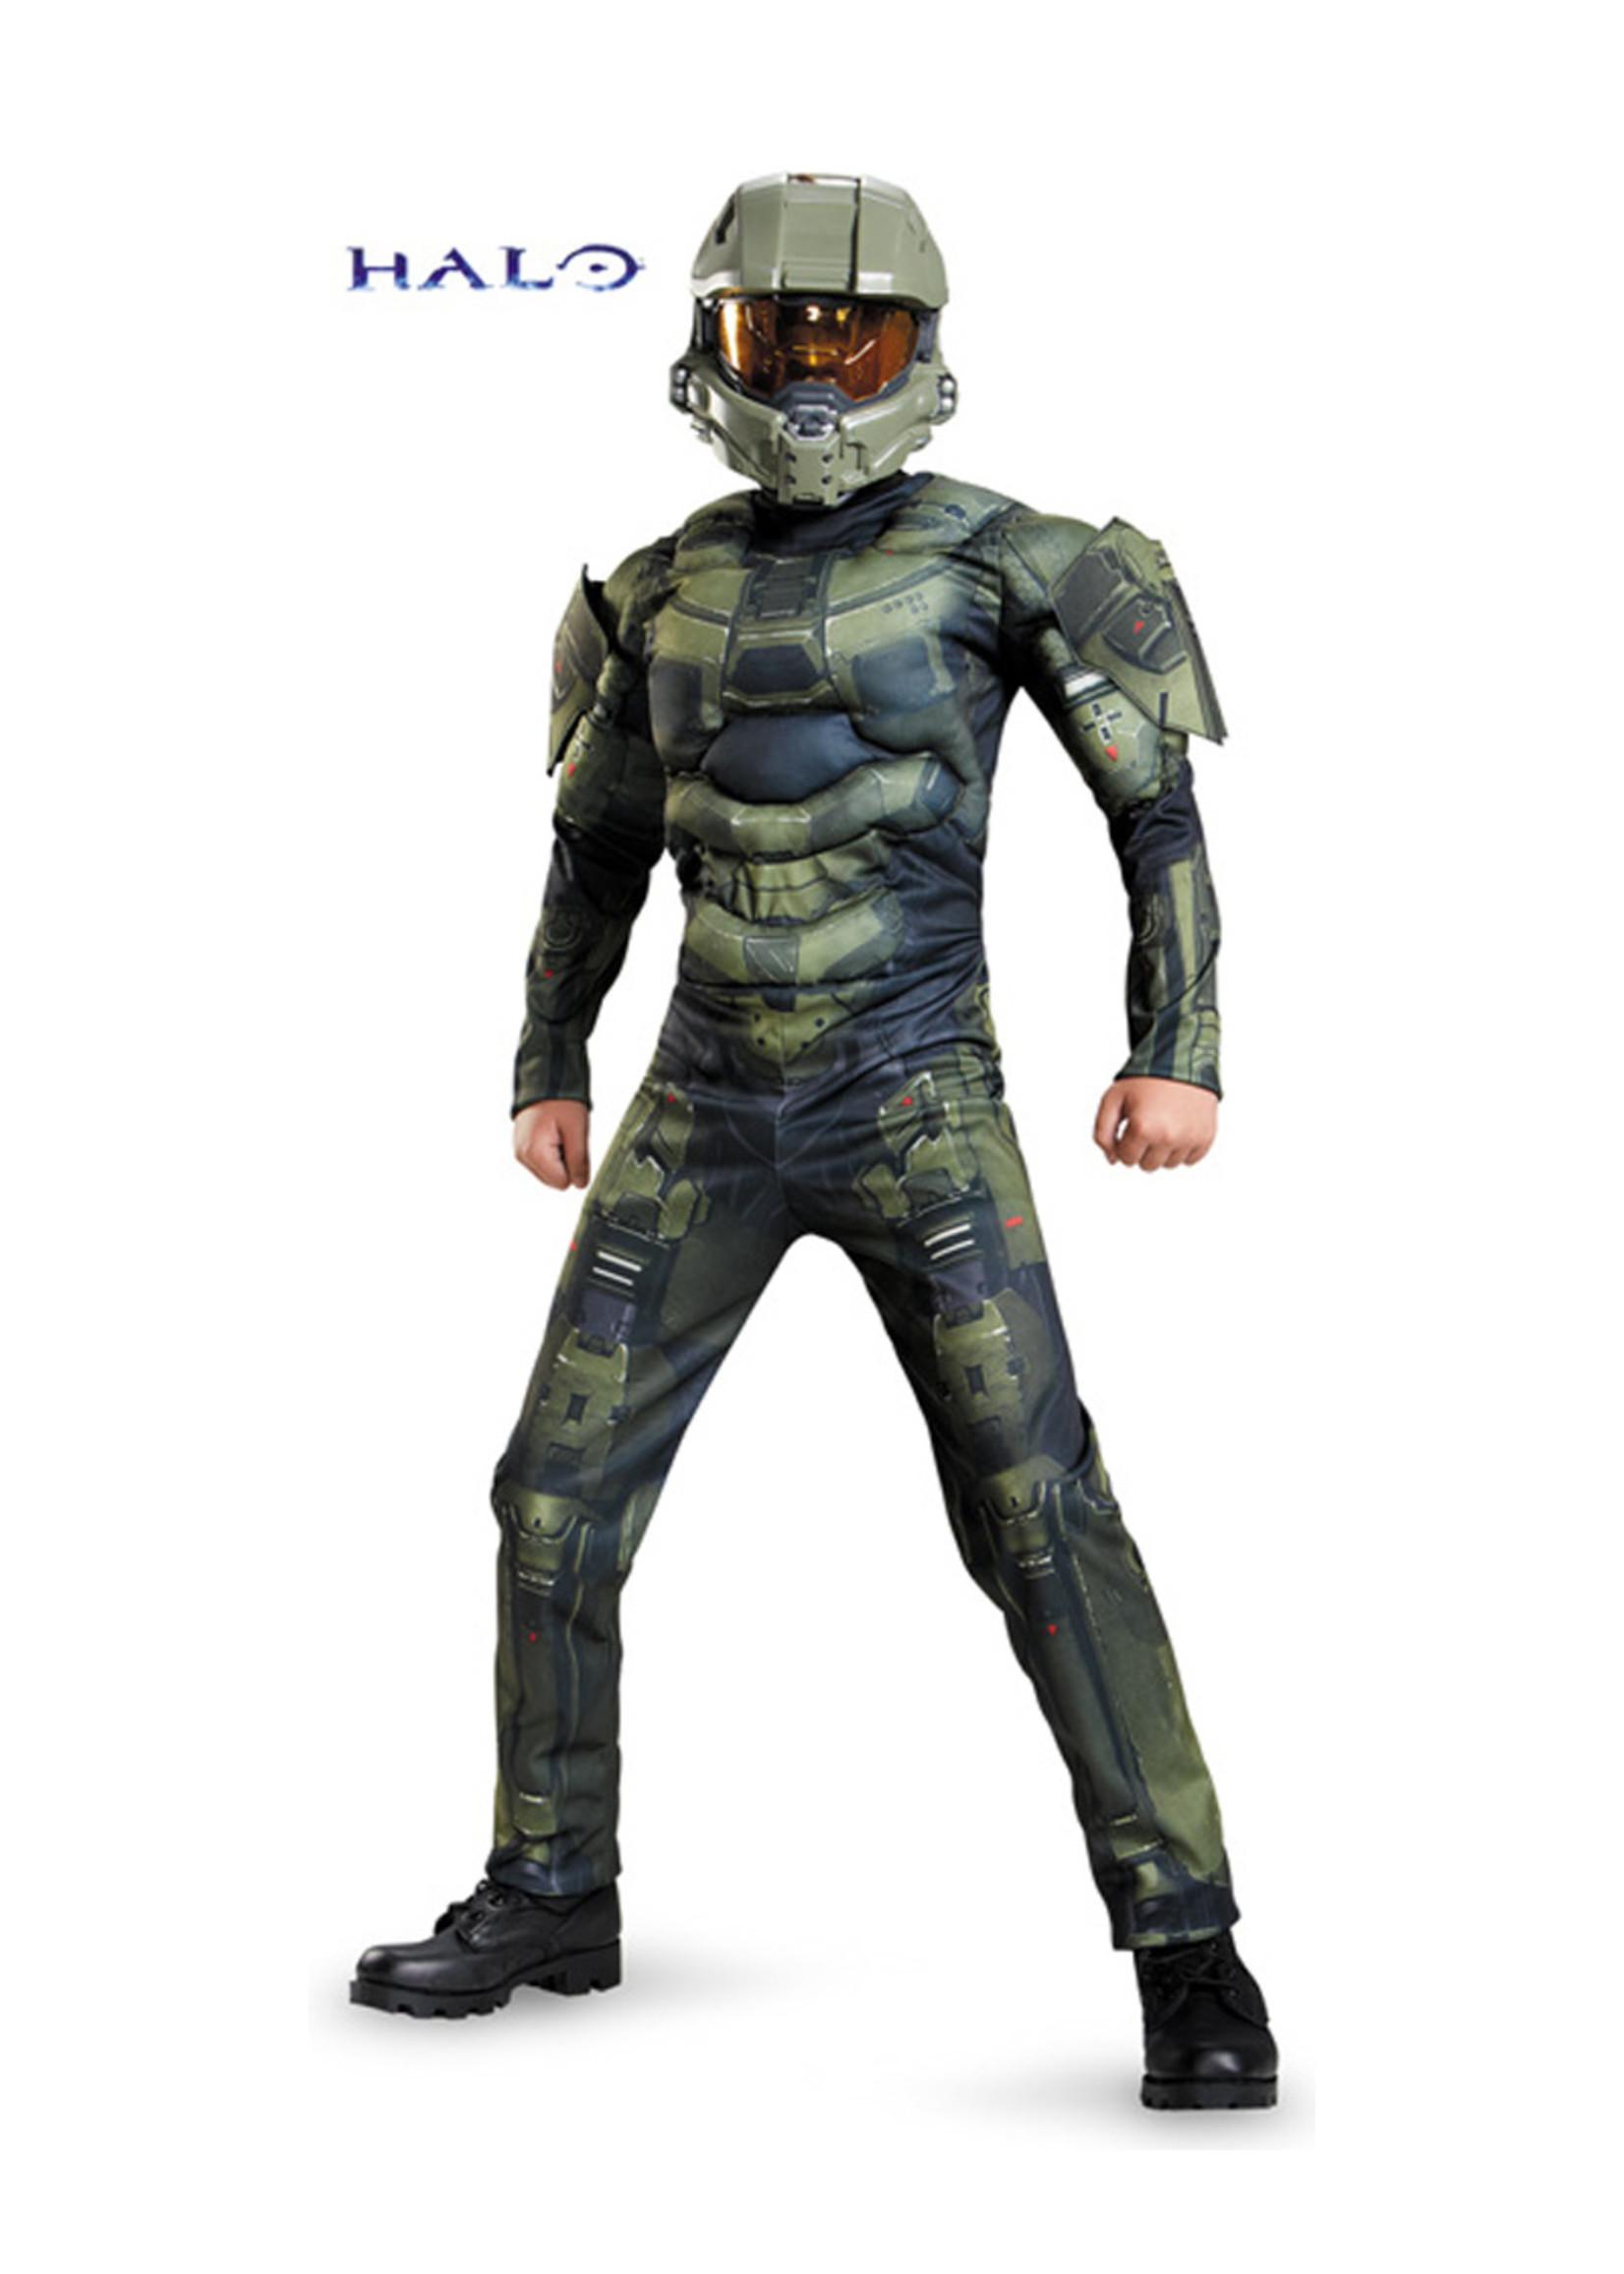 Halo Master Chief Costume - Boys